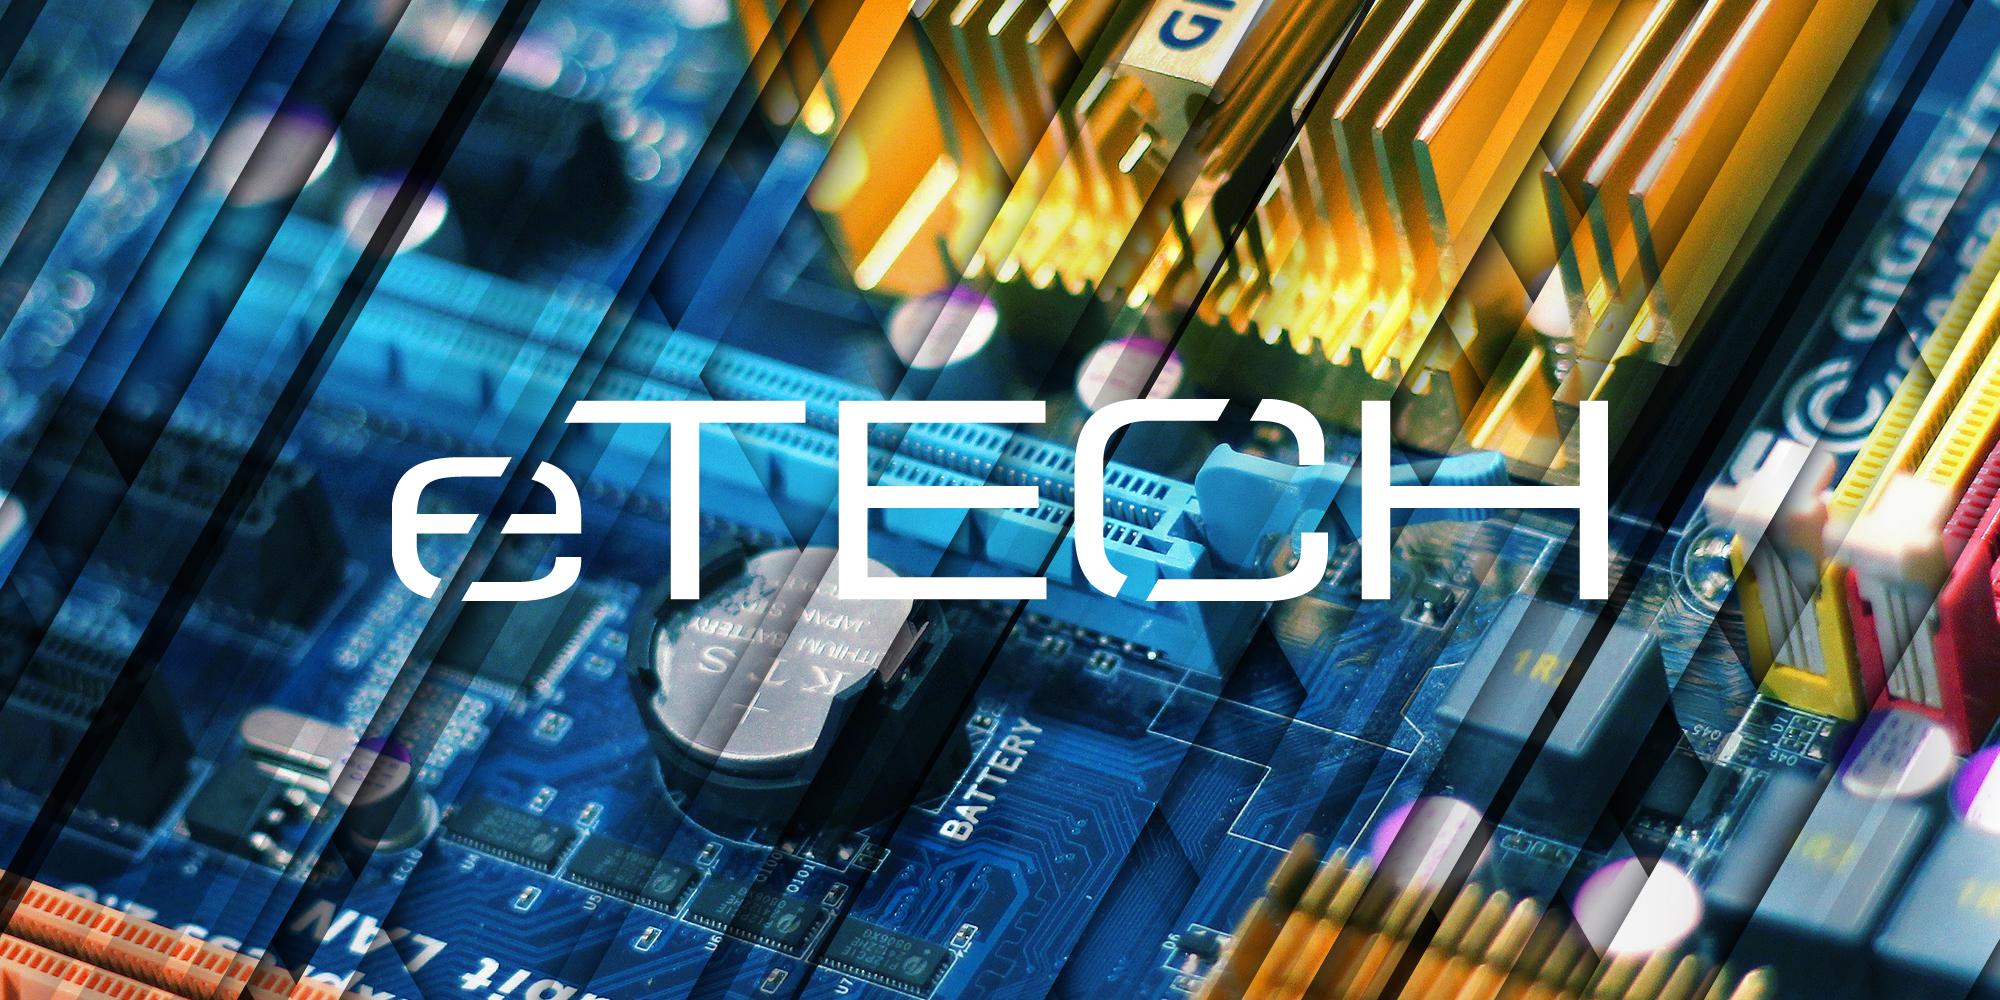 ETECH-logo-06.jpg